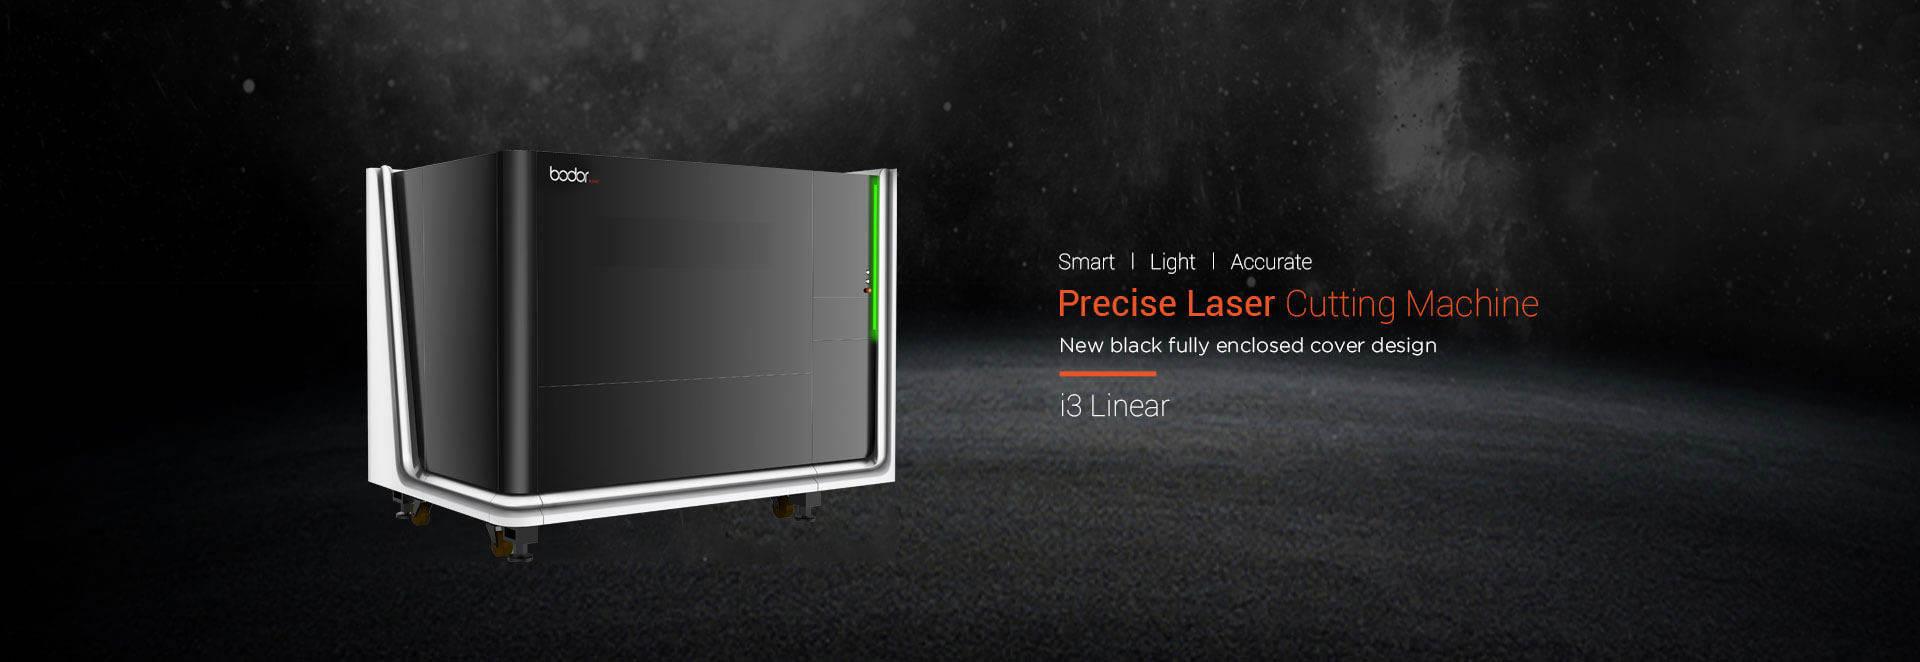 i7 Serija Lasera Visoke Preciznosti